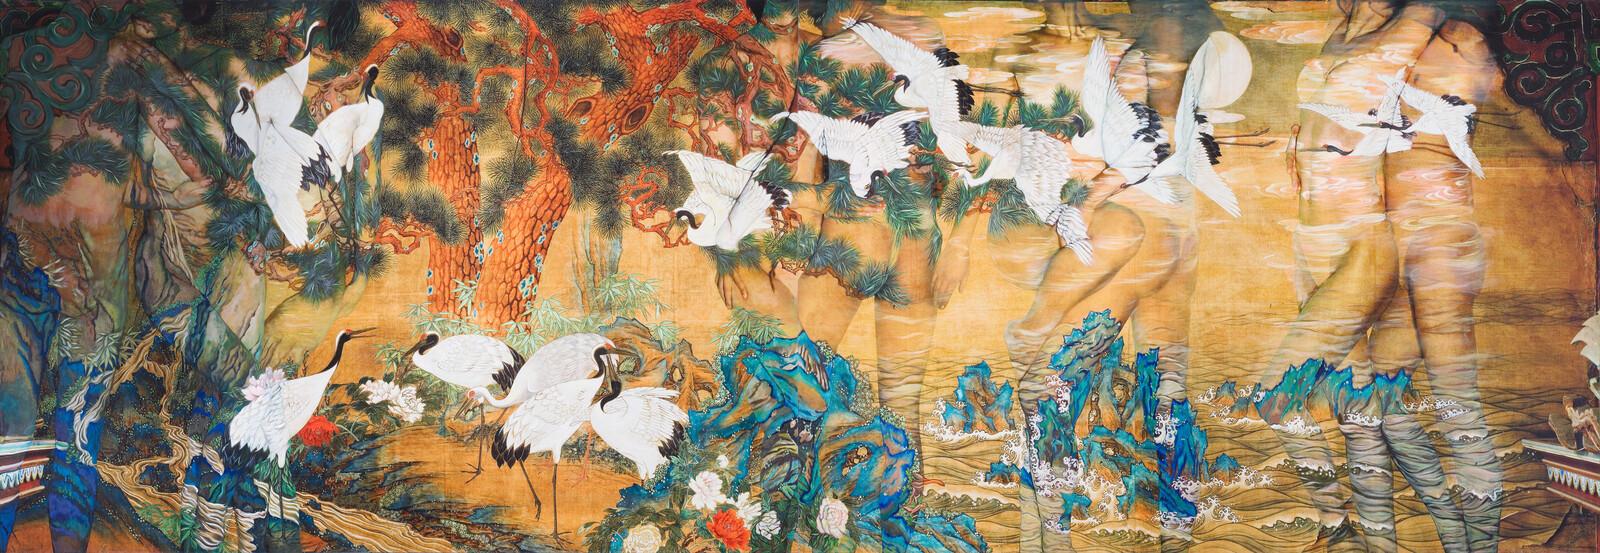 White Crane - Dallae Bae